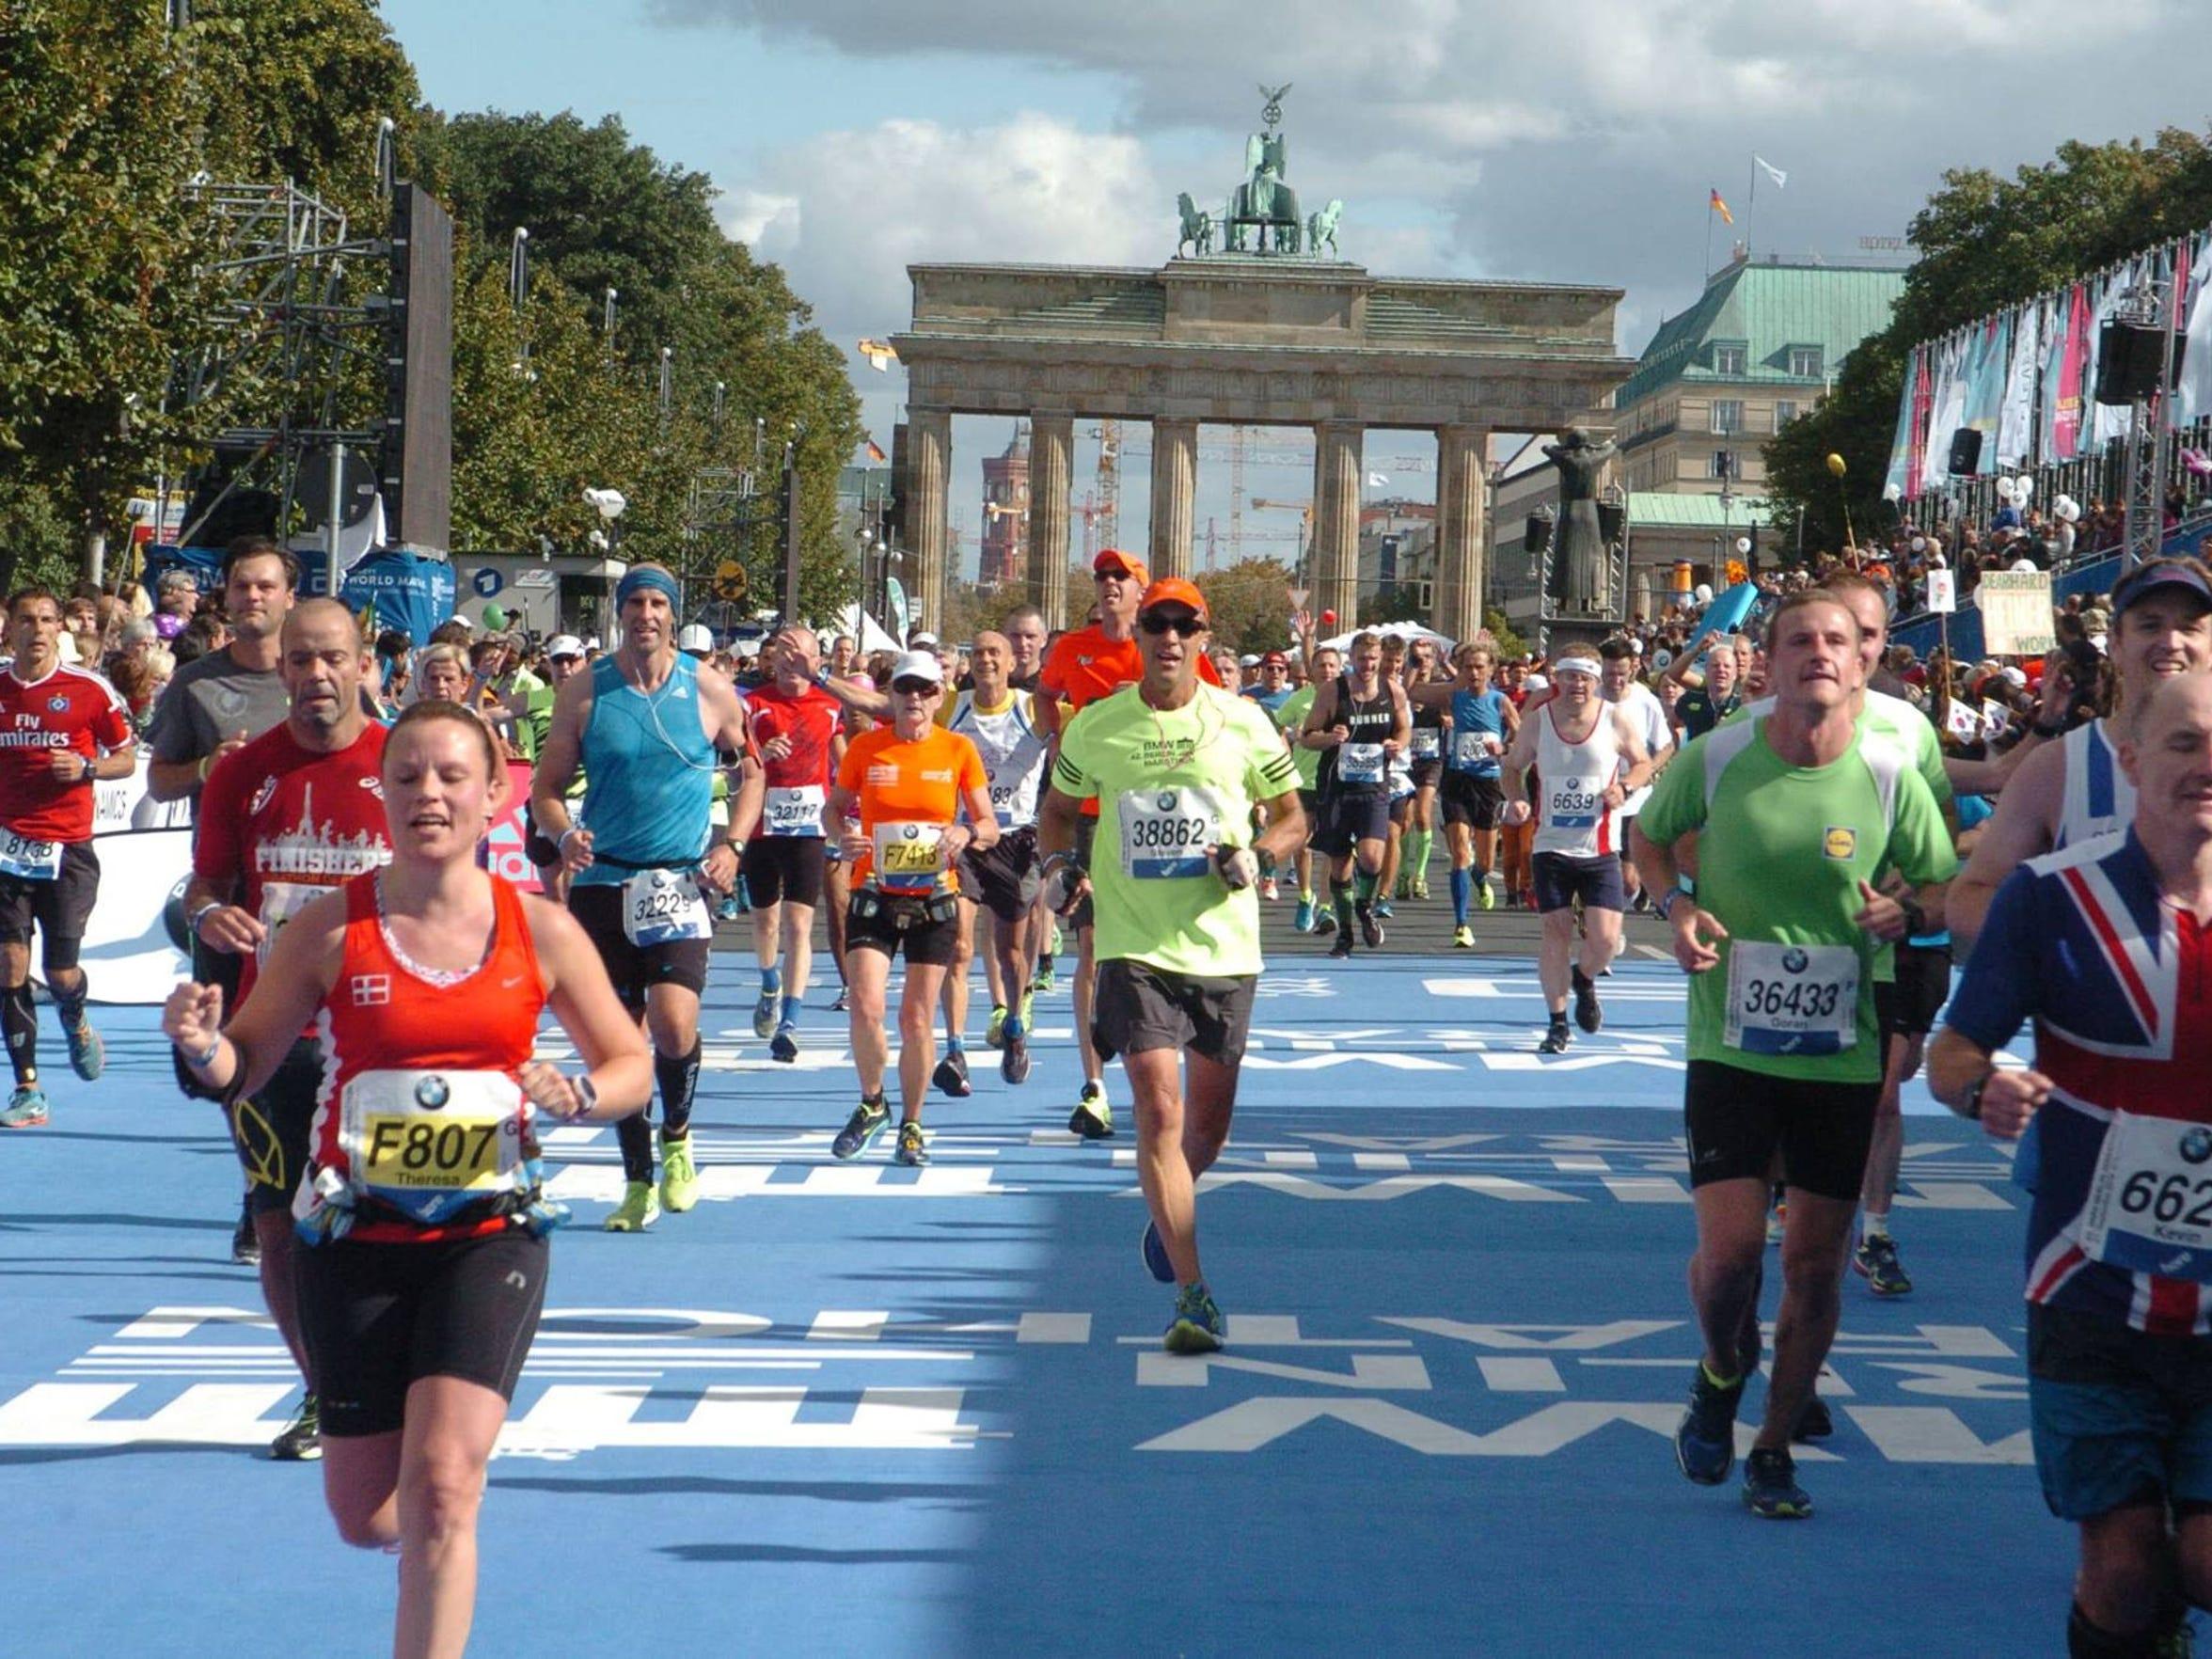 Steven Heithoff (middle) runs in the Berlin Marathon.